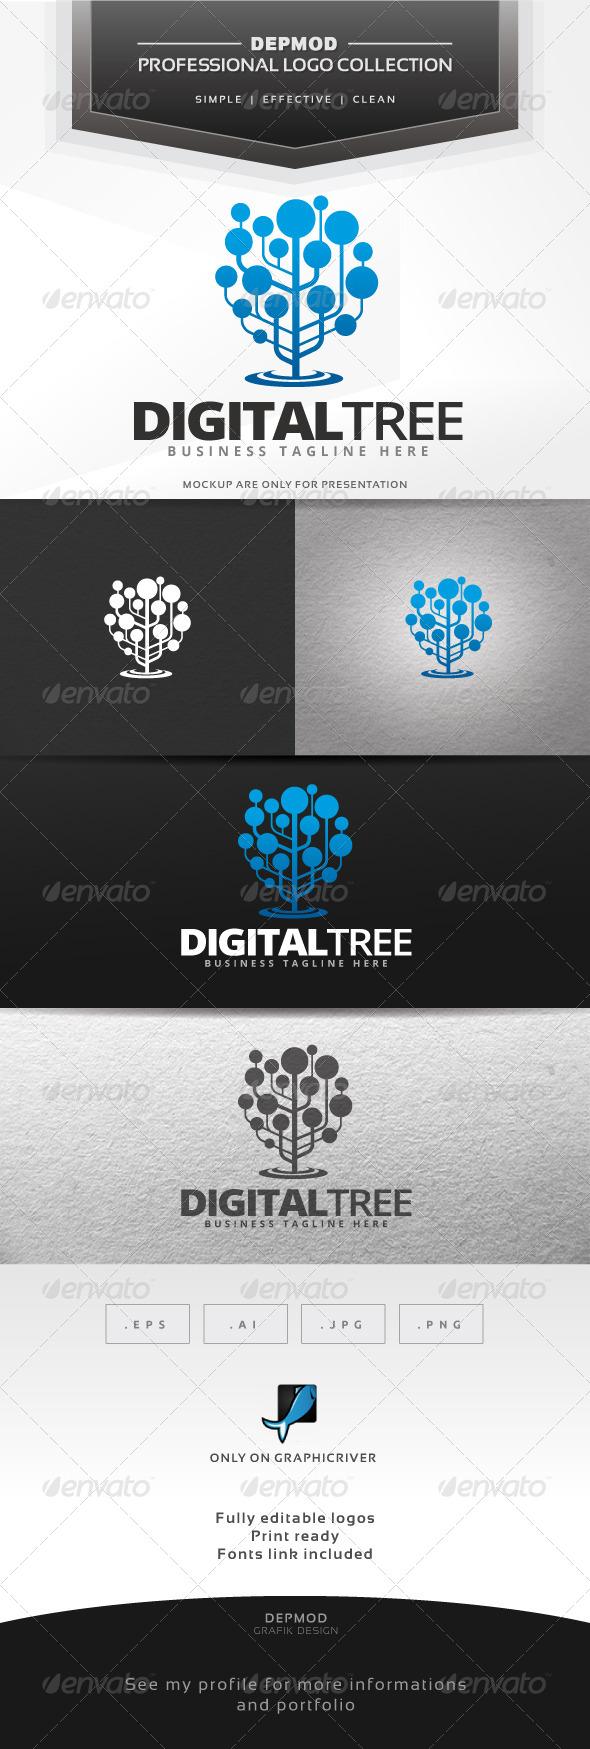 GraphicRiver Digital Tree Logo 7593329